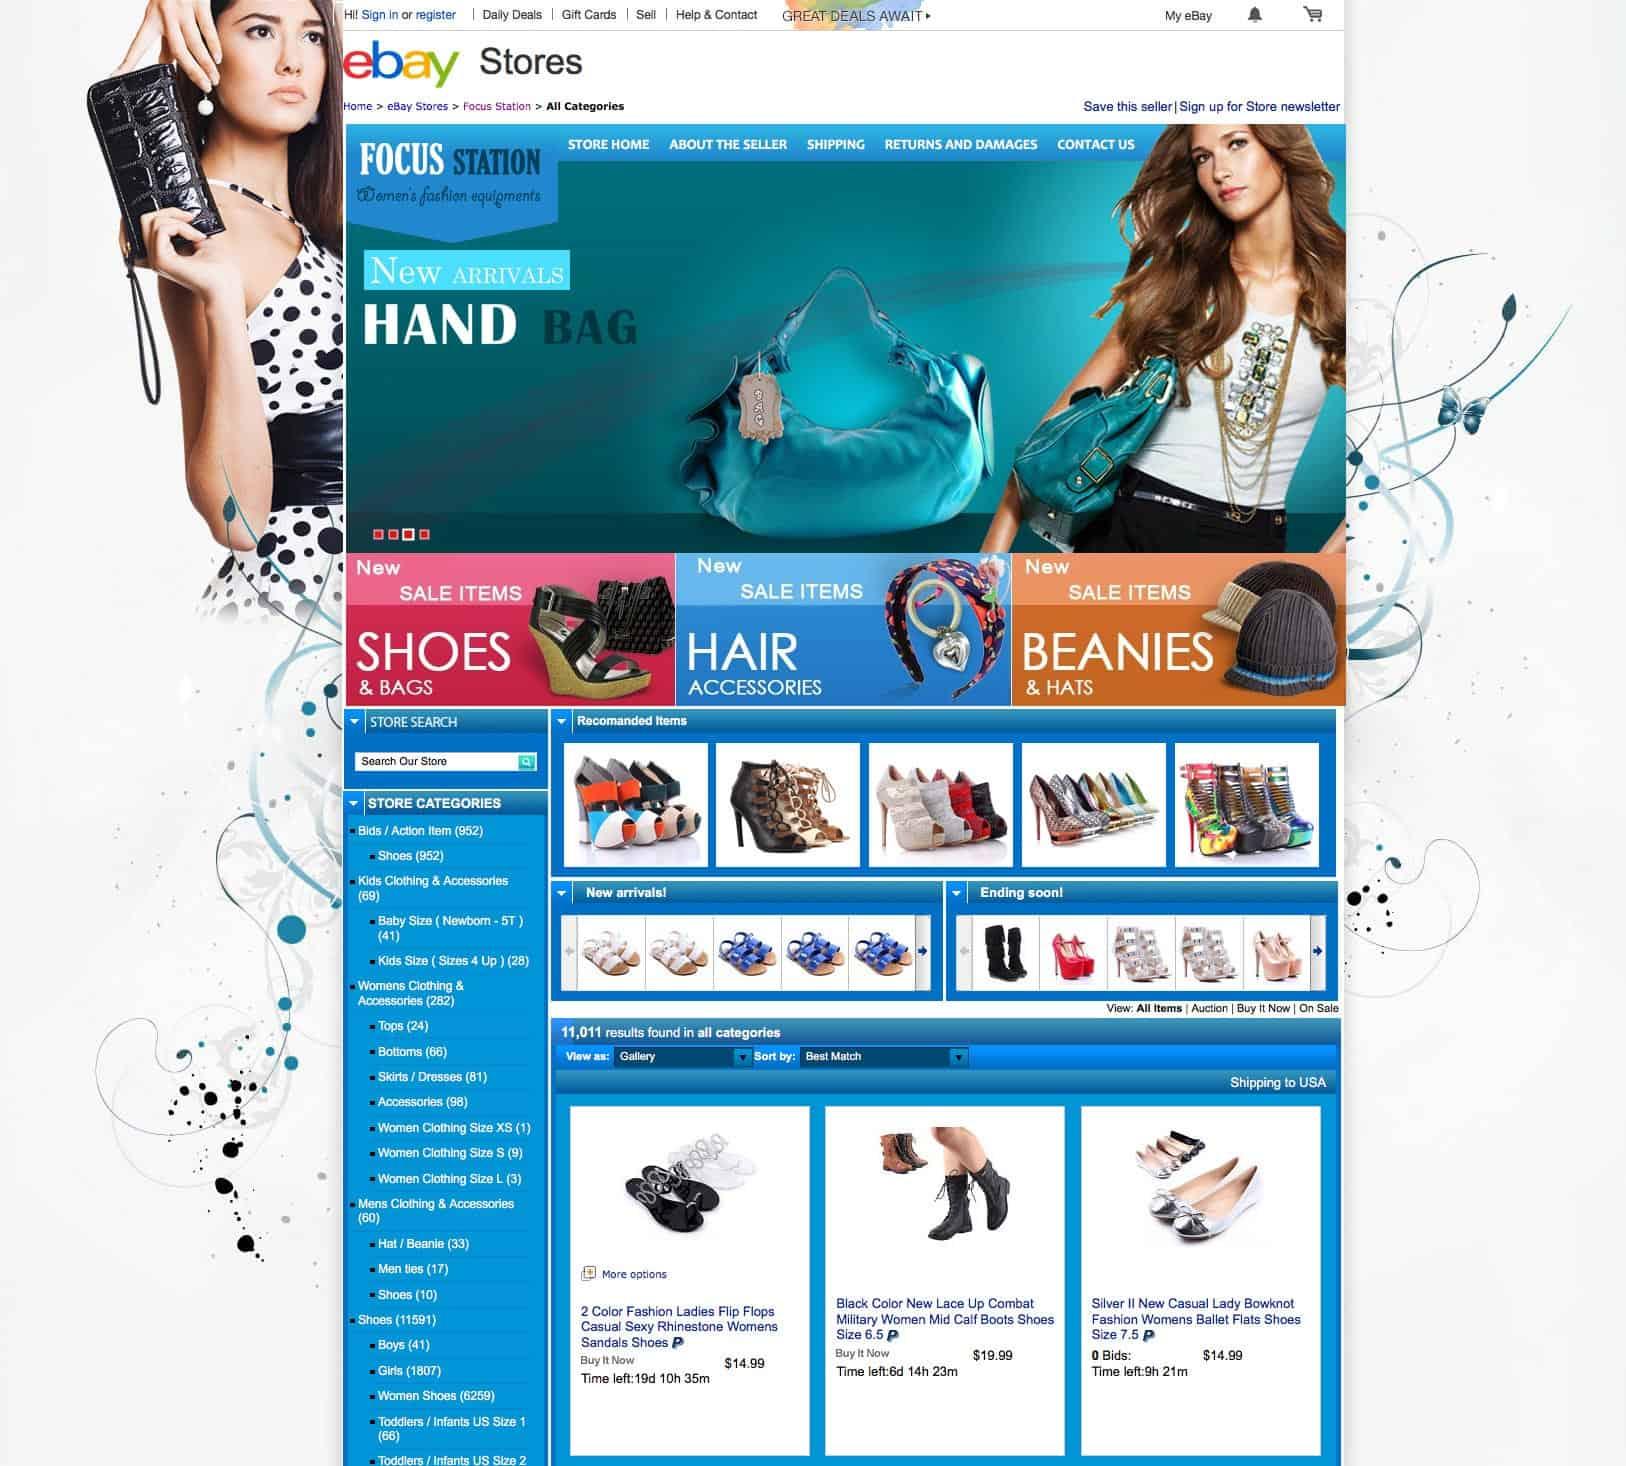 Focus Station - eBay store front design